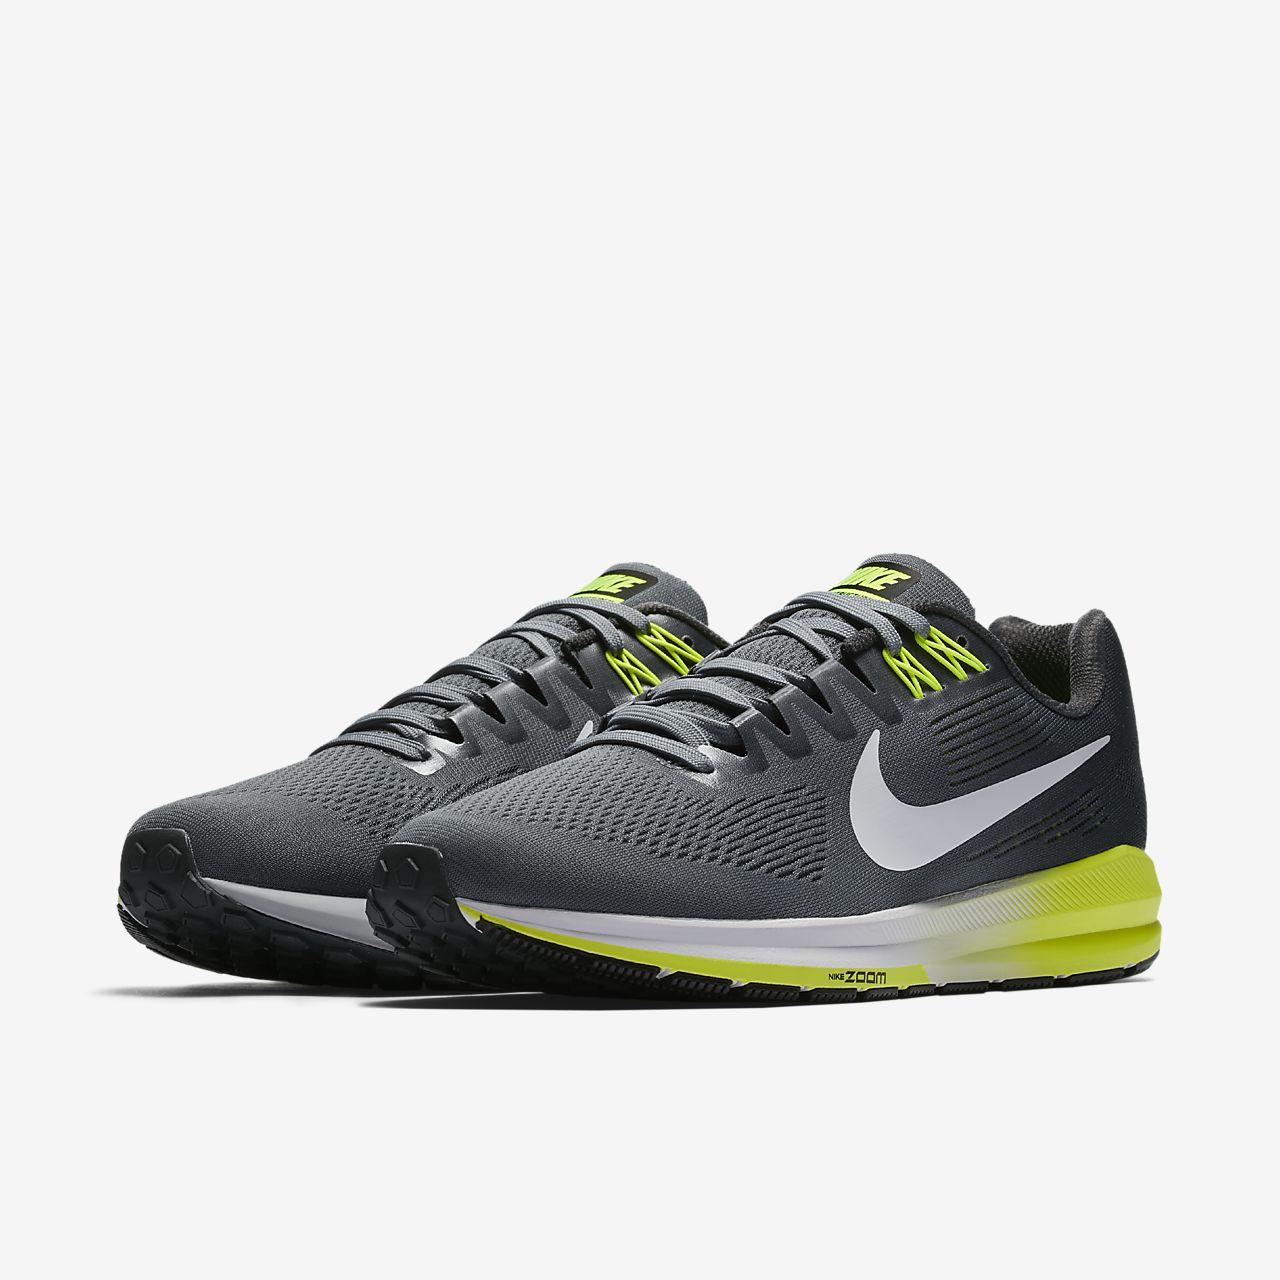 Nike Air Zoom Structure 21 | Nike, Air zoom, Best nike